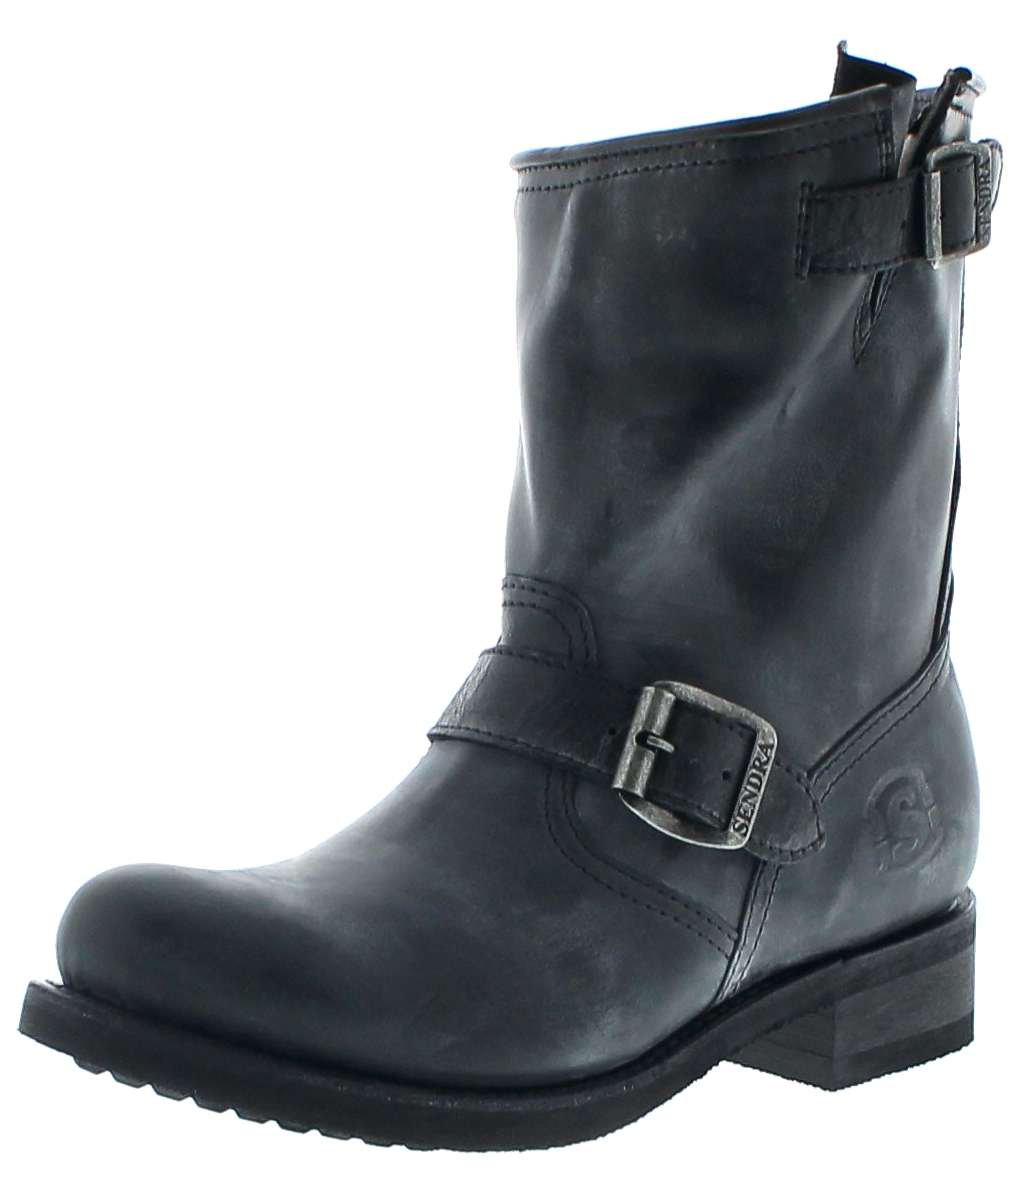 Sendra Boots 10849 Negro Merenillo Ladies Engineer boots with merino fur lining - black